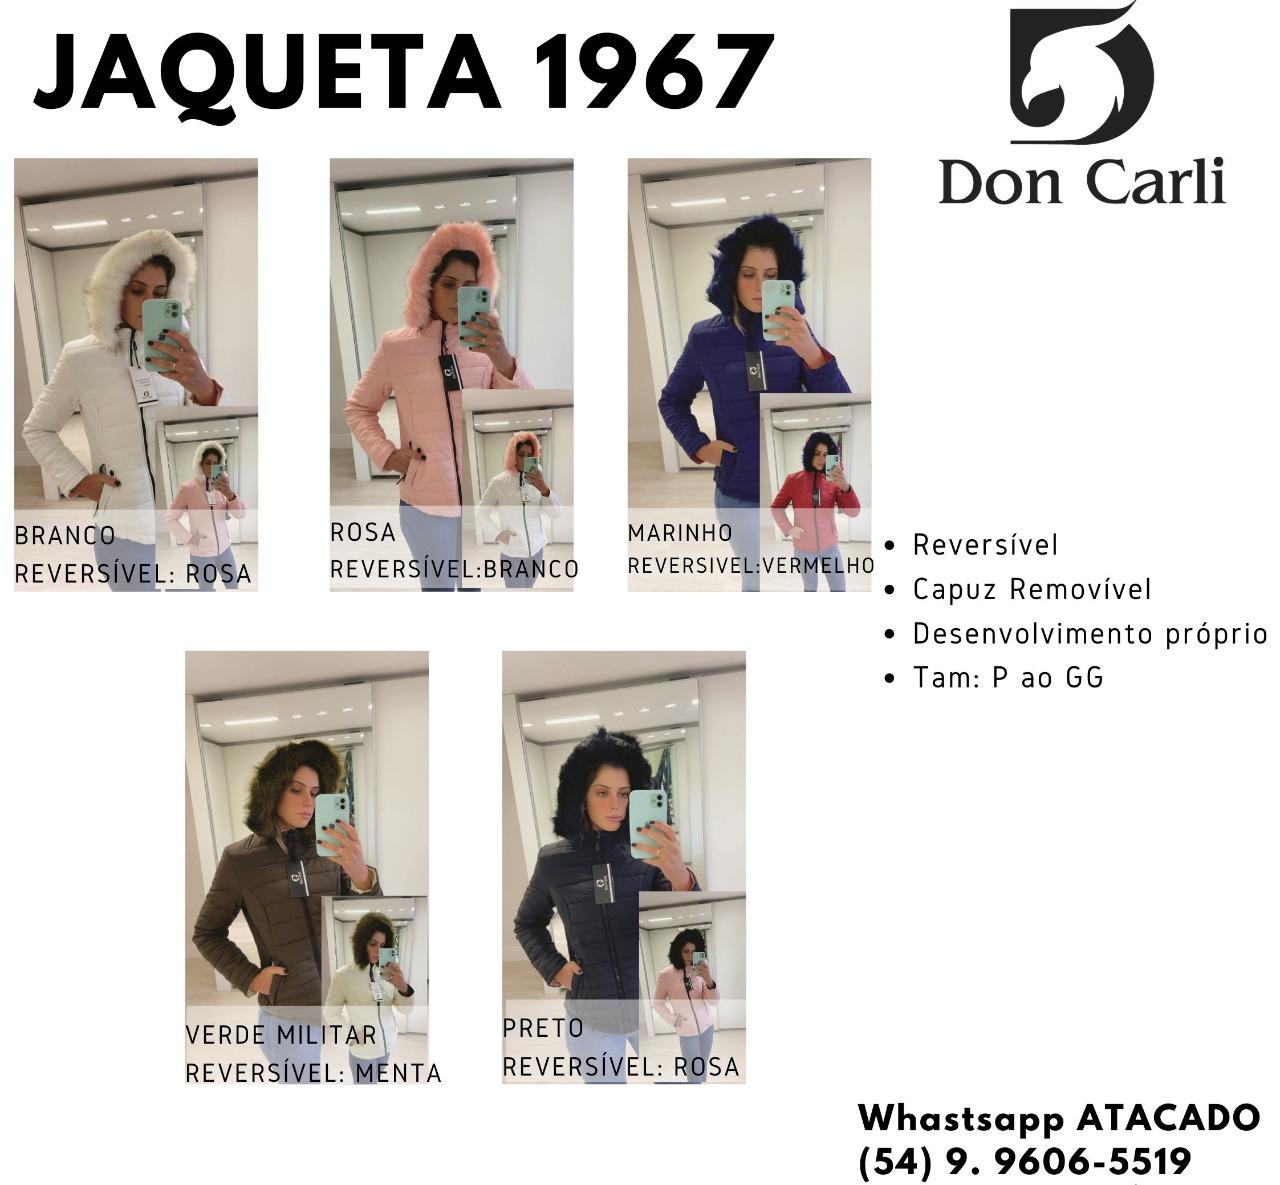 Jaqueta Don Carli 1967